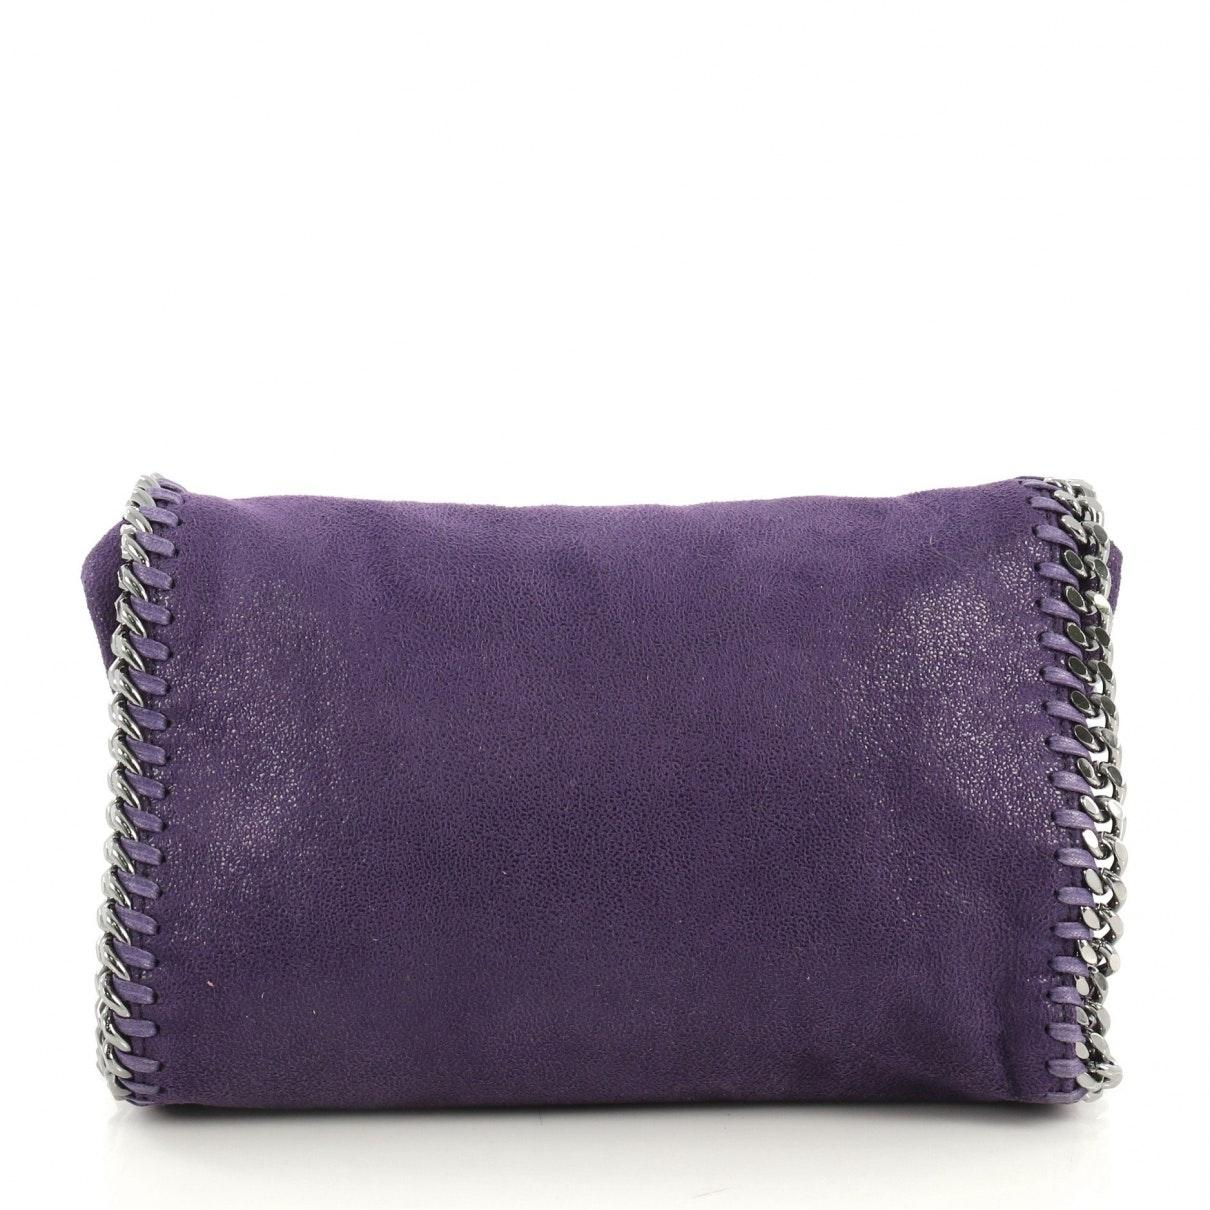 Sac à main Falabella en Cuir Violet Cuir Stella McCartney en coloris Violet H6PE